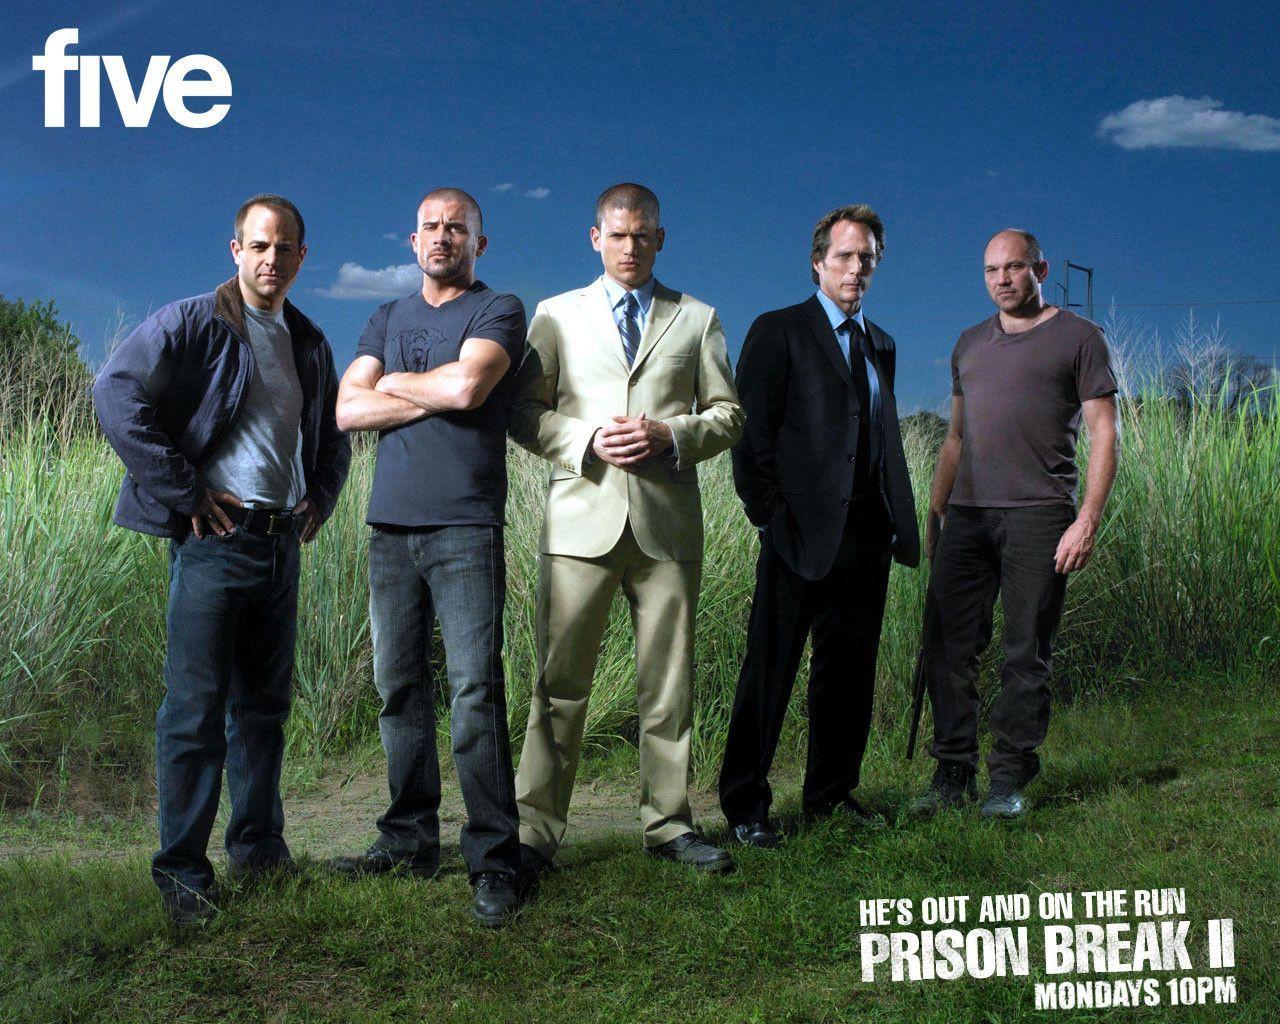 Prison Break Season 4 Wallpapers - Wallpaper Cave | Images ...